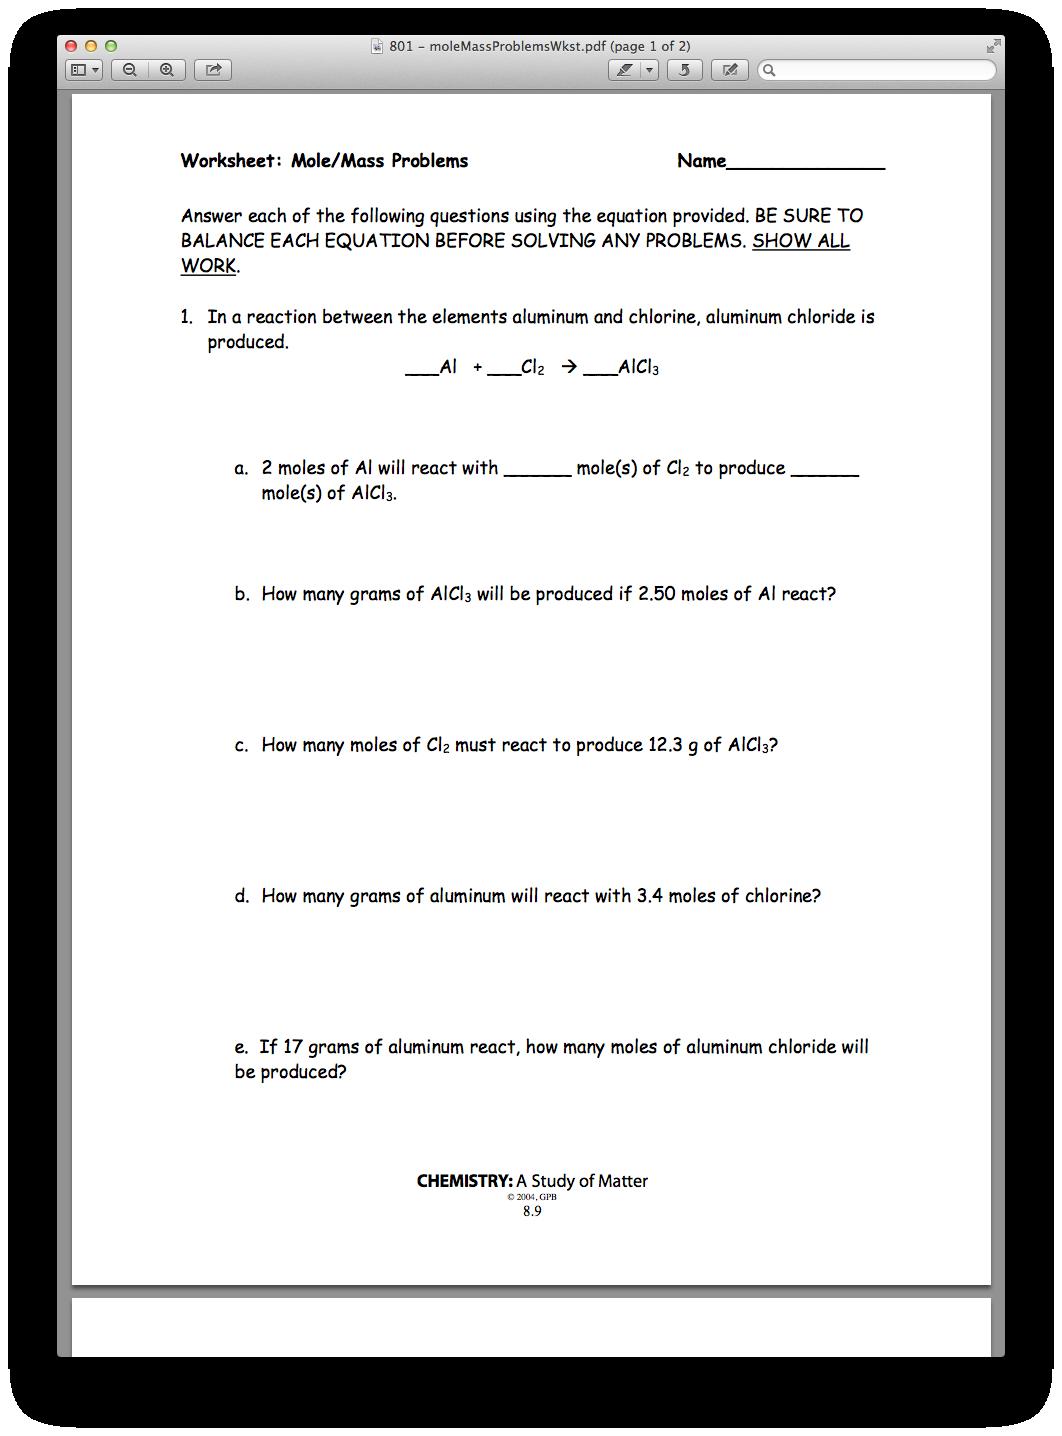 Chemistry Chapter 08, Lesson 01 - Mole/Mole and Mole/Mass ...